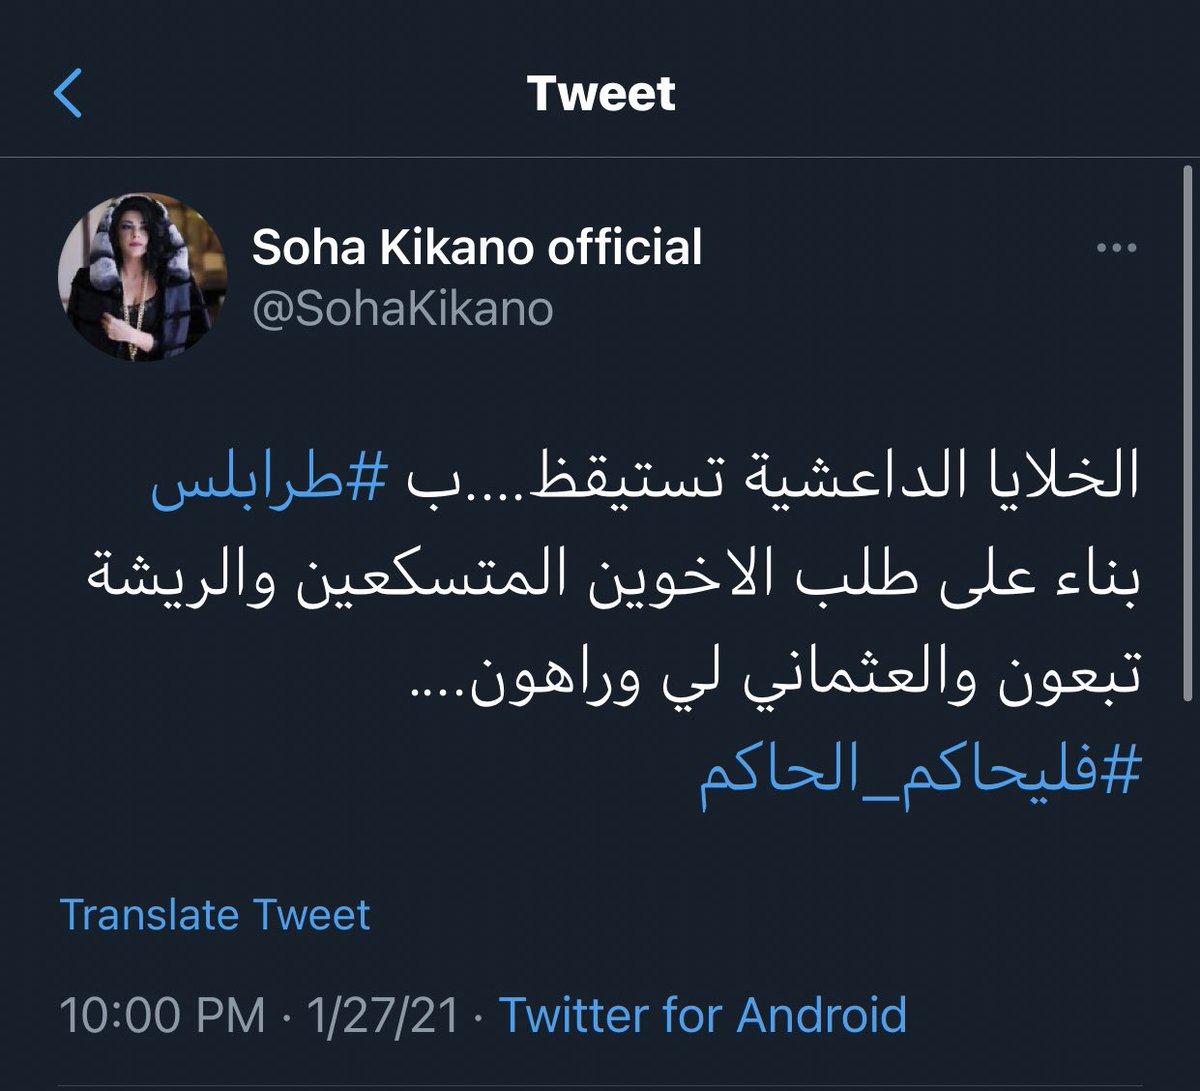 Replying to @Michelshamoun: ما حدا داعشي غير أنت ورئيسك وحزبك وأختك على أخت تيارك